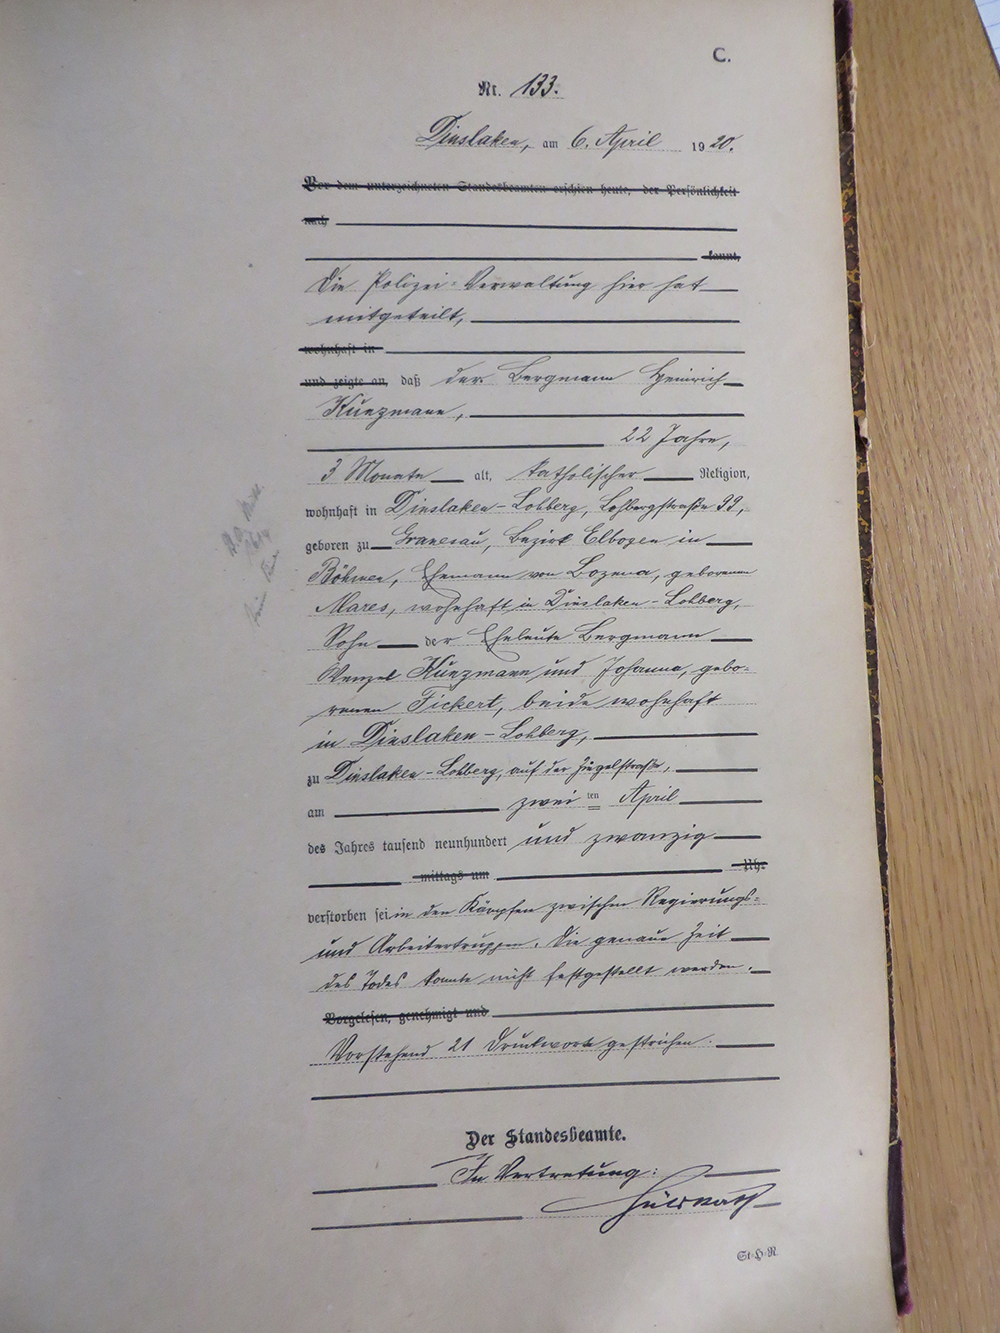 133.06.04.20. Heinrich Kunzmann (22)